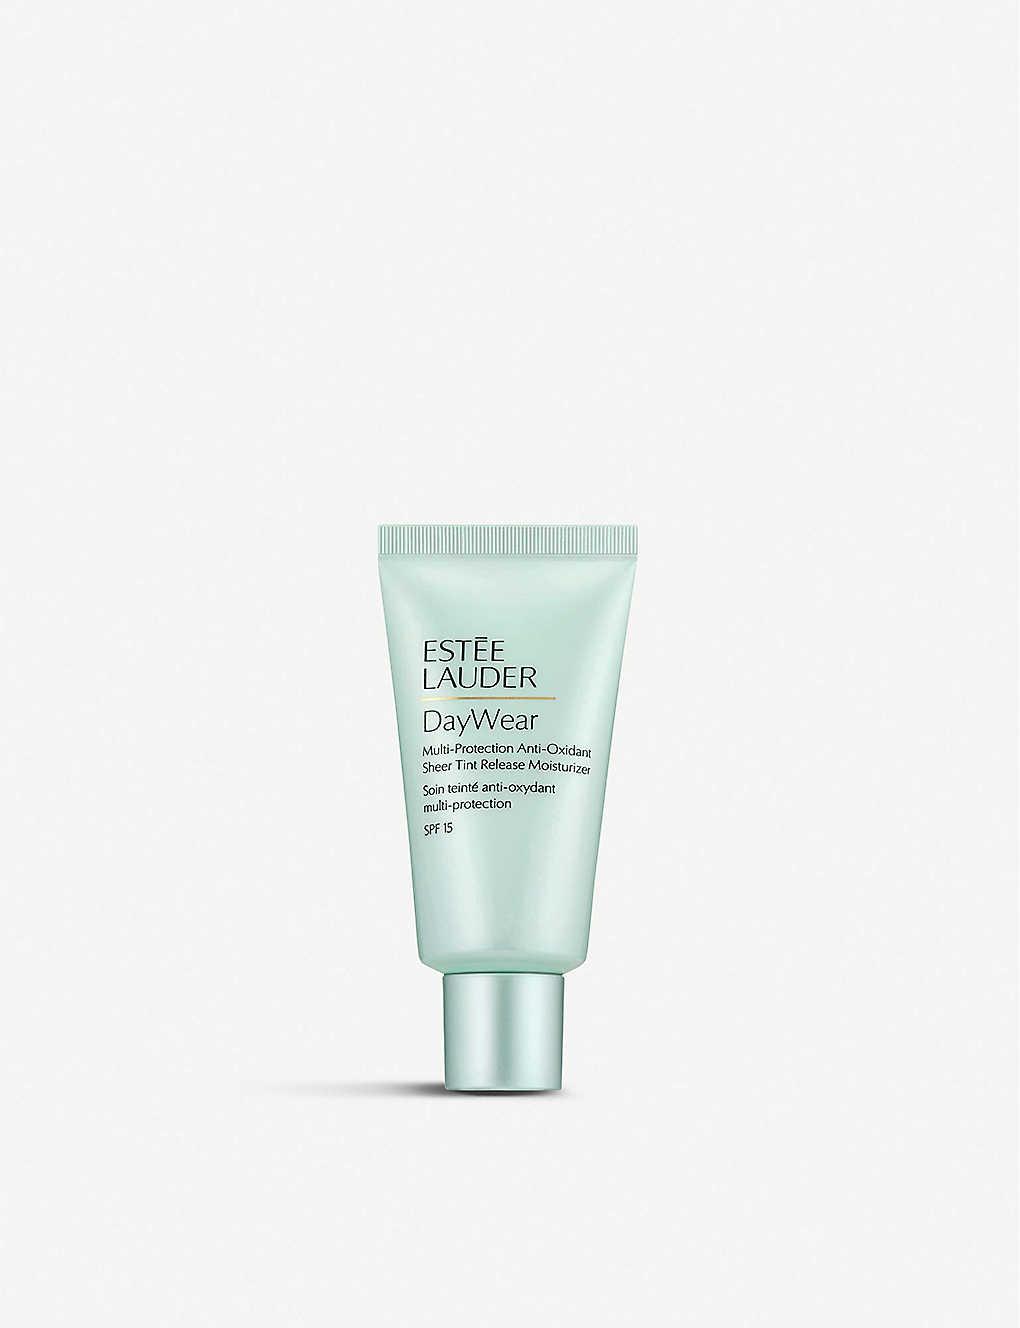 Estee Lauder Daywear Sheer Tint Release Advanced Multi Protection Anti Oxidant Moisturiser Spf15 15ml Selfridges Com